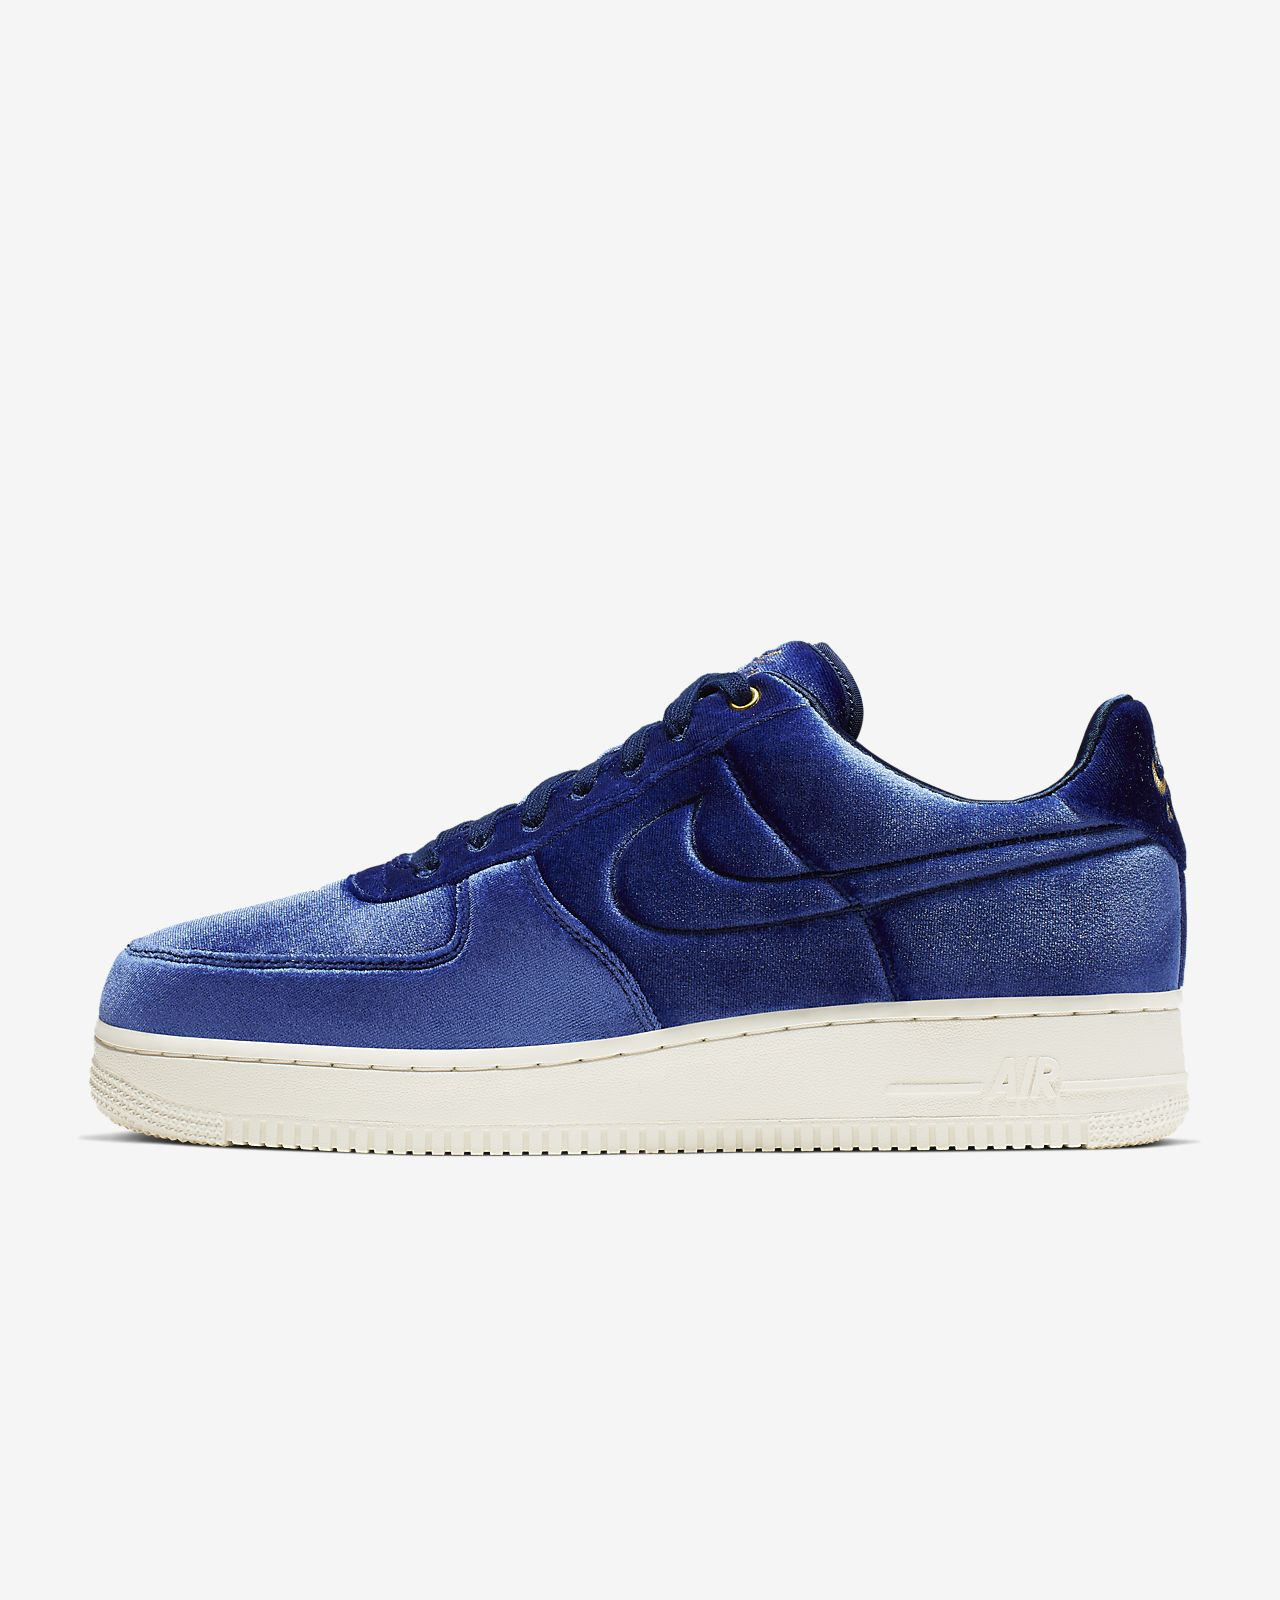 Nike Air Force 1 '07 Premium 3 sko til herre